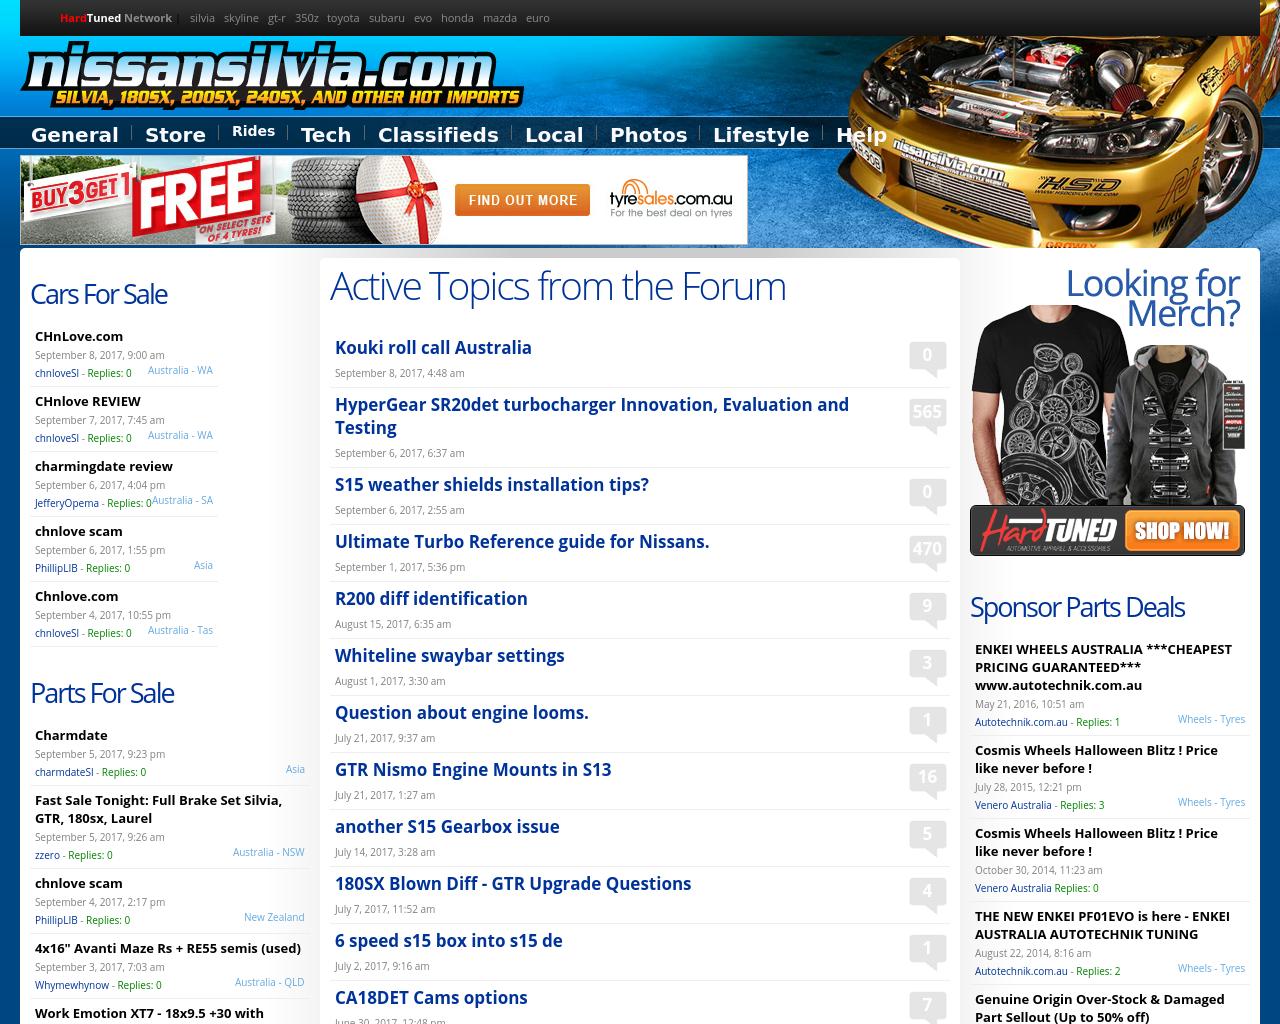 nissansilvia.com-Advertising-Reviews-Pricing